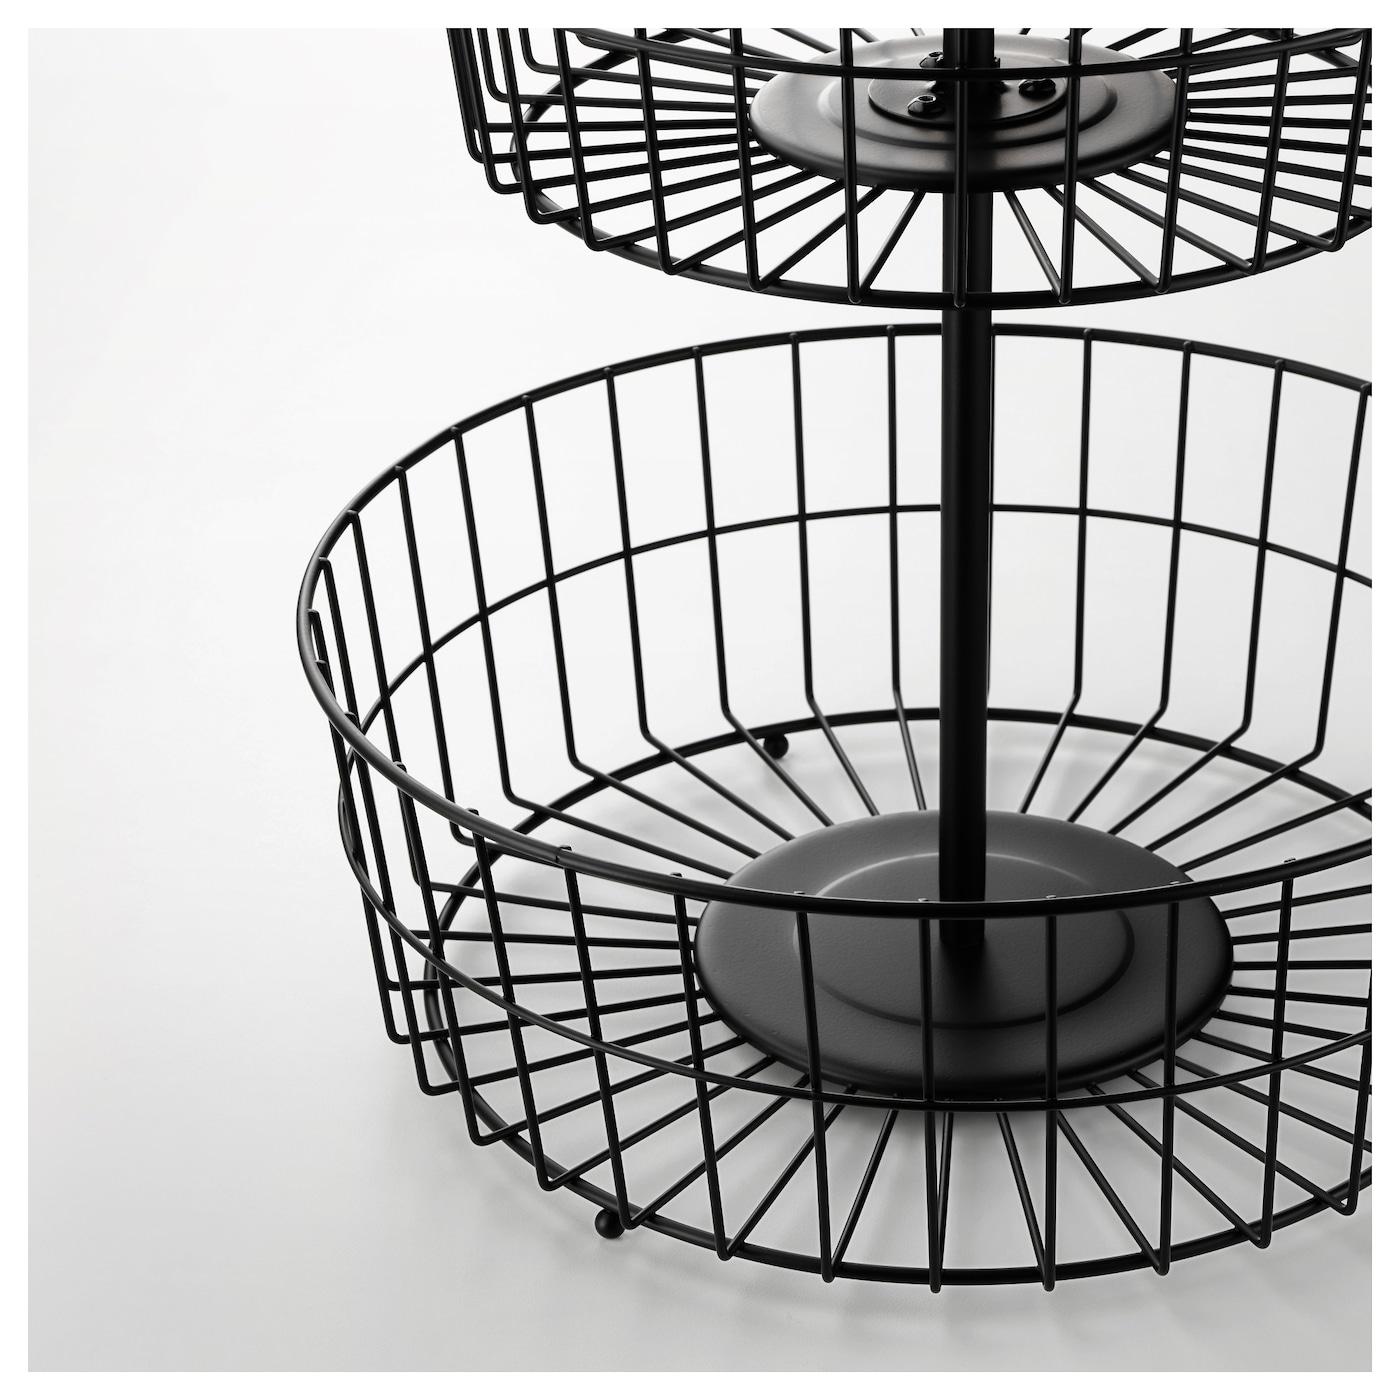 sommar 2018 tag re 3 corbeilles noir ikea. Black Bedroom Furniture Sets. Home Design Ideas